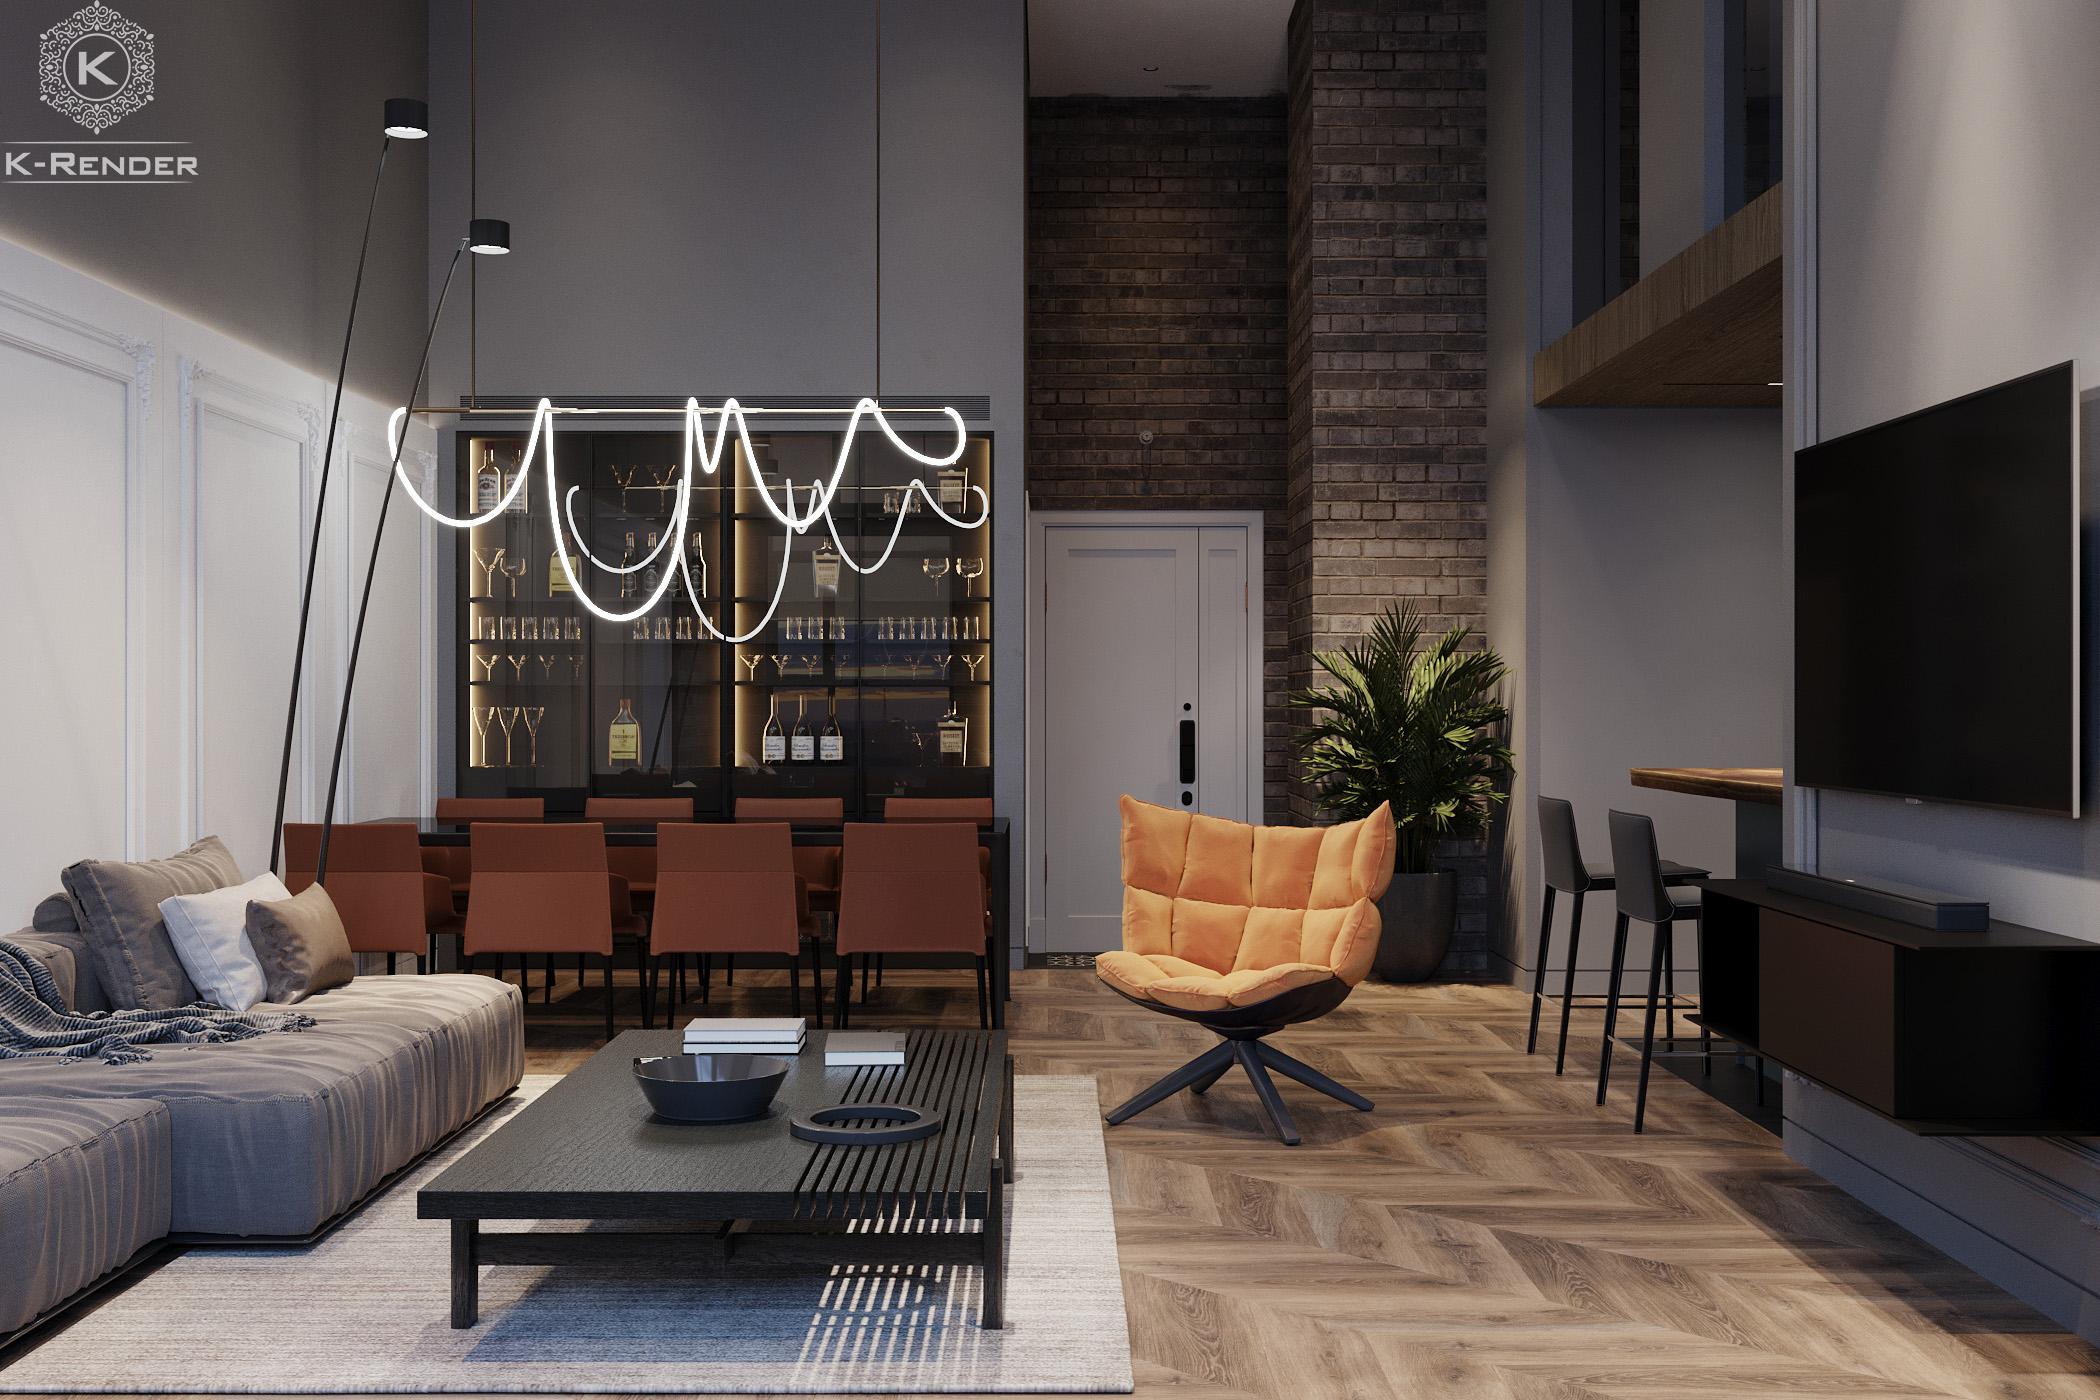 sunshine-apartment-k-render-studio-3d-rendering-studio-2